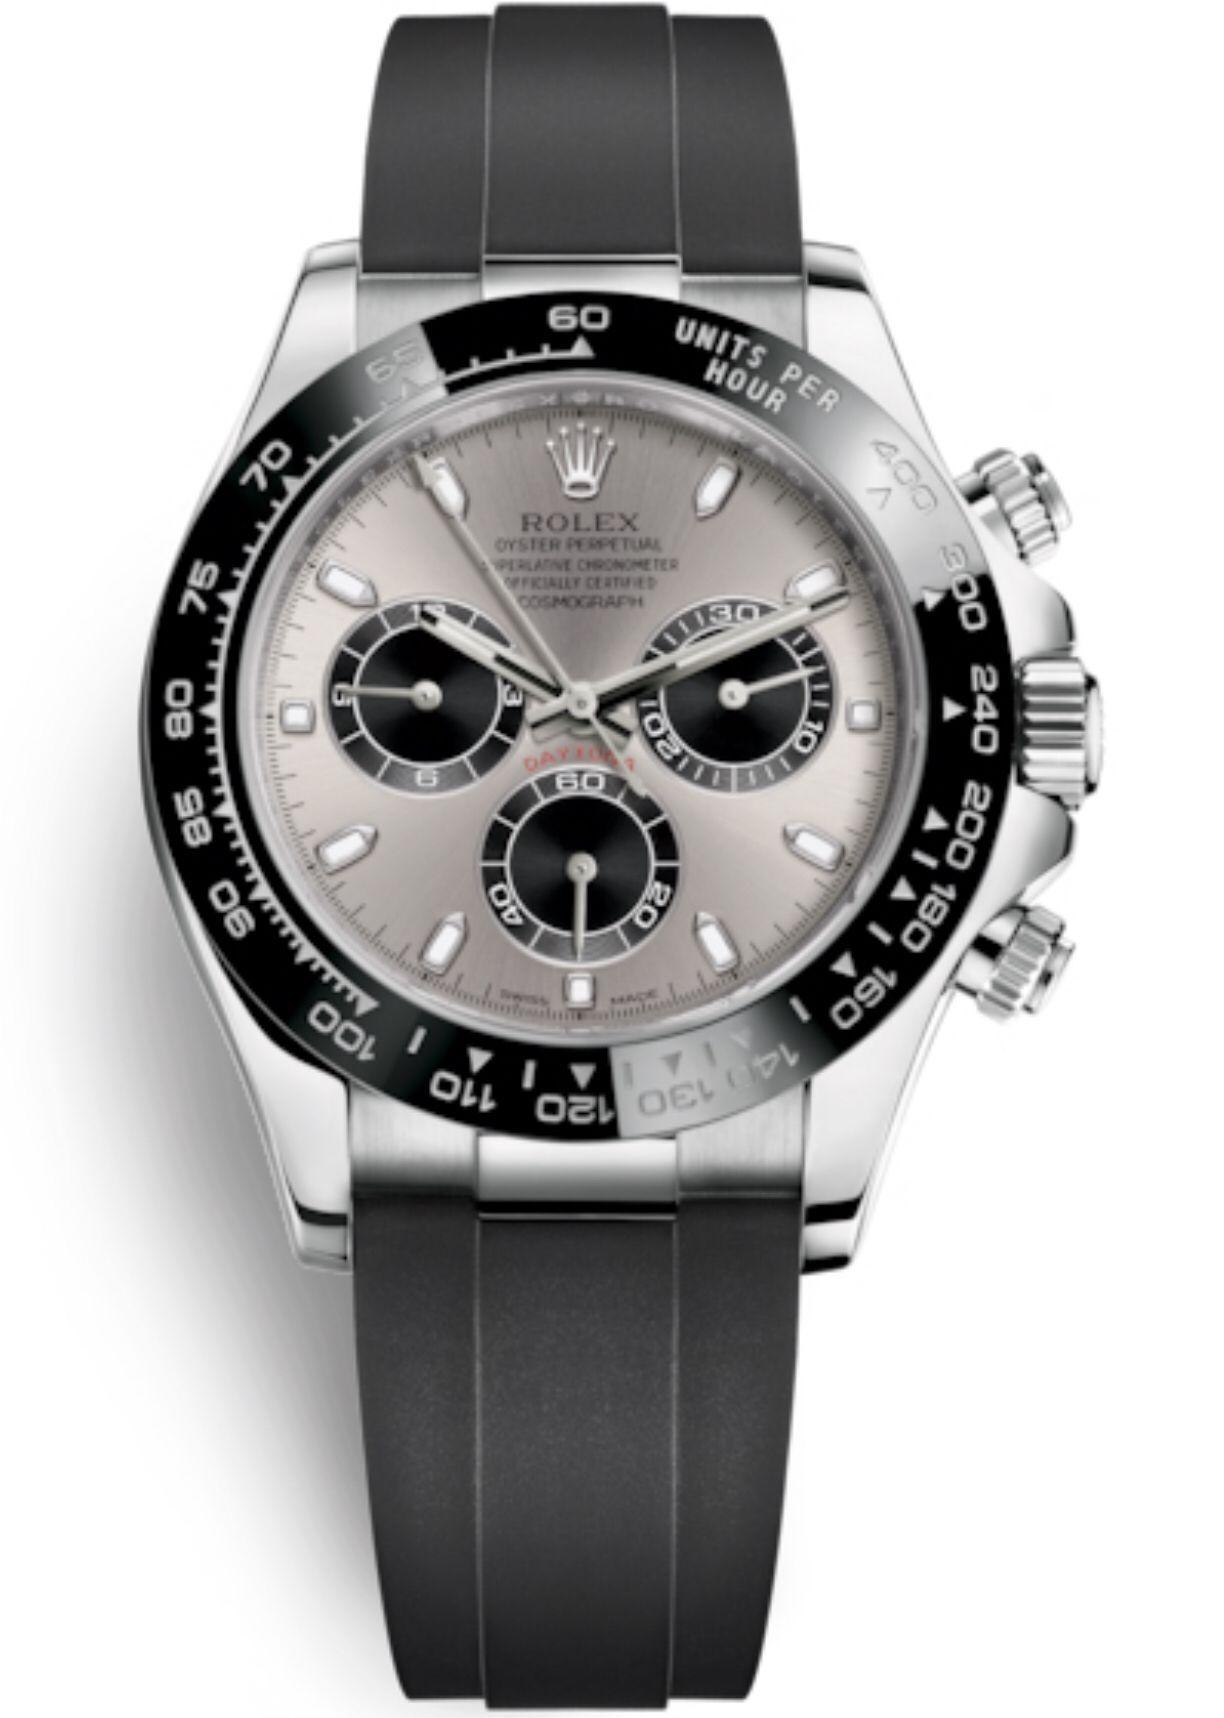 justaboutwatches watches Luxury watches for men, Rolex